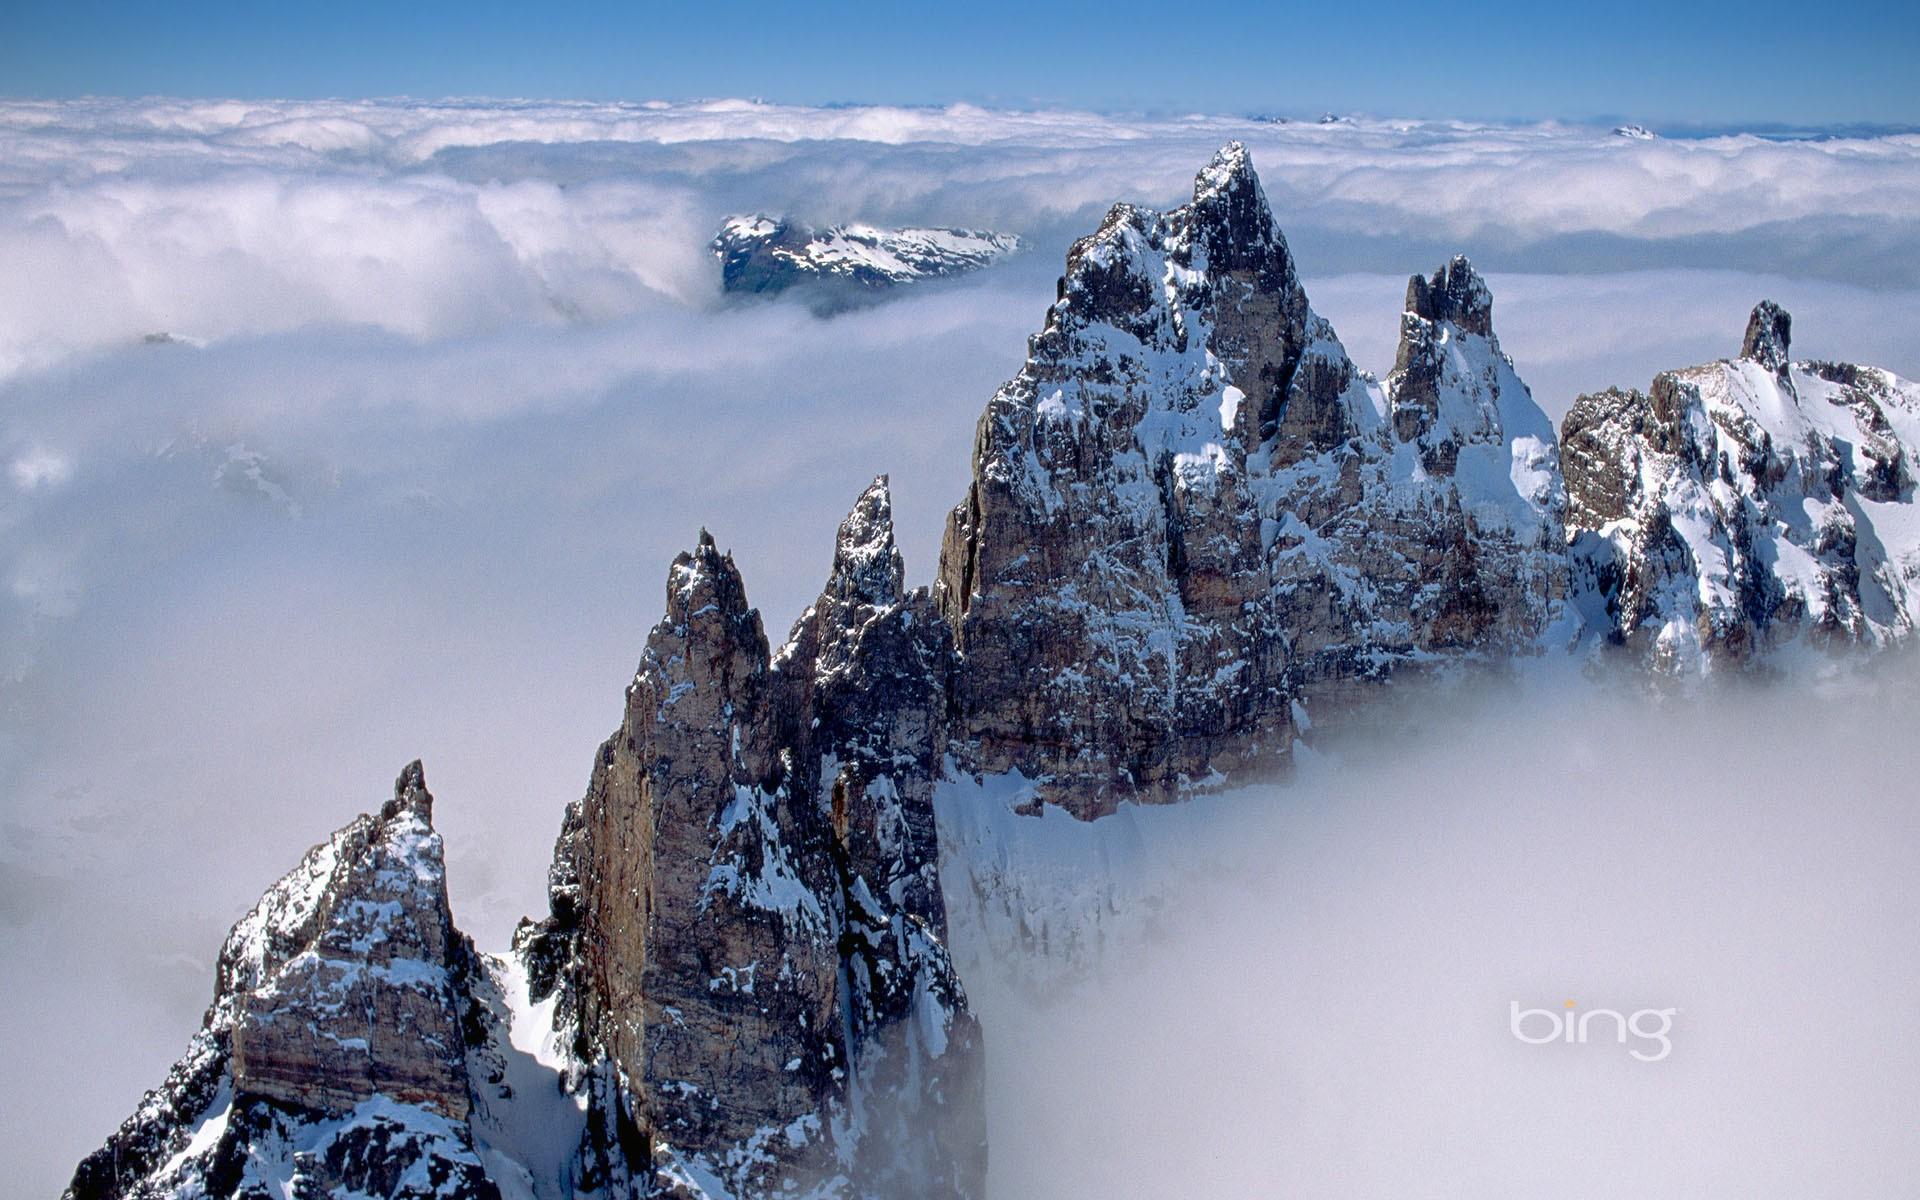 Pictures Download Bing Wallpapers Hd Desktop Wallpapers - Mountain Peaks Above Clouds , HD Wallpaper & Backgrounds